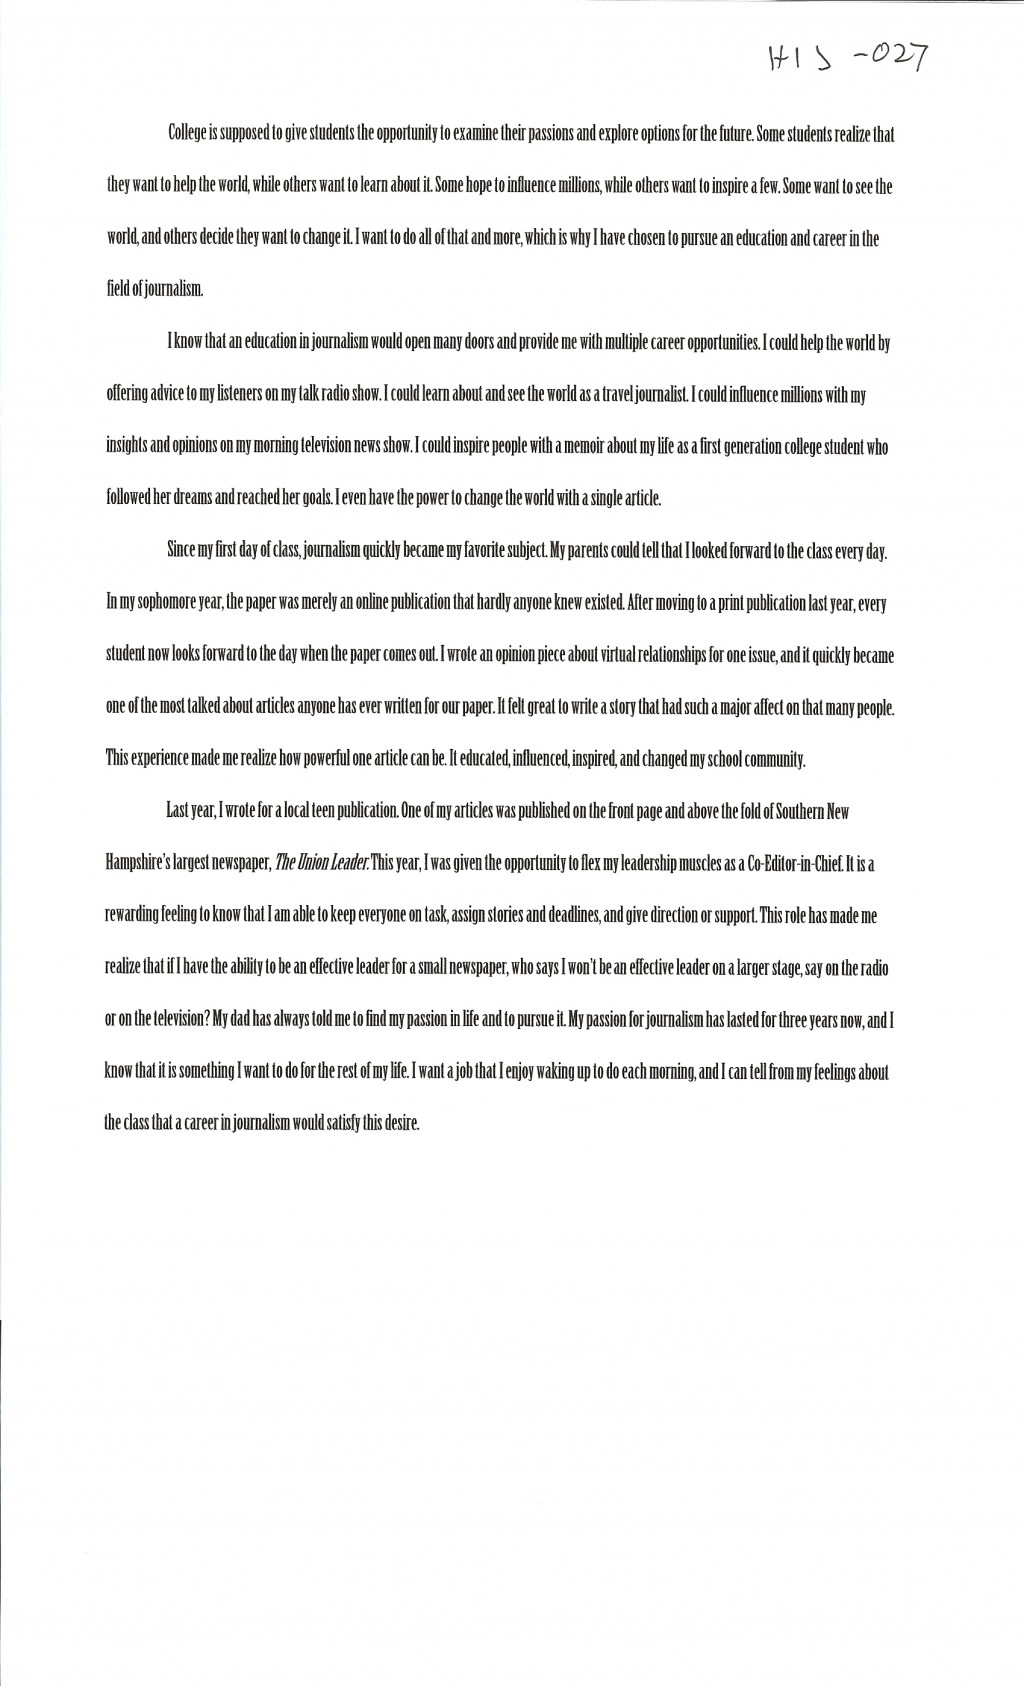 005 Alexa Serrecchia Essay Leaderships Unique Leadership Examples Application Sample Personal Philosophy Uc Large